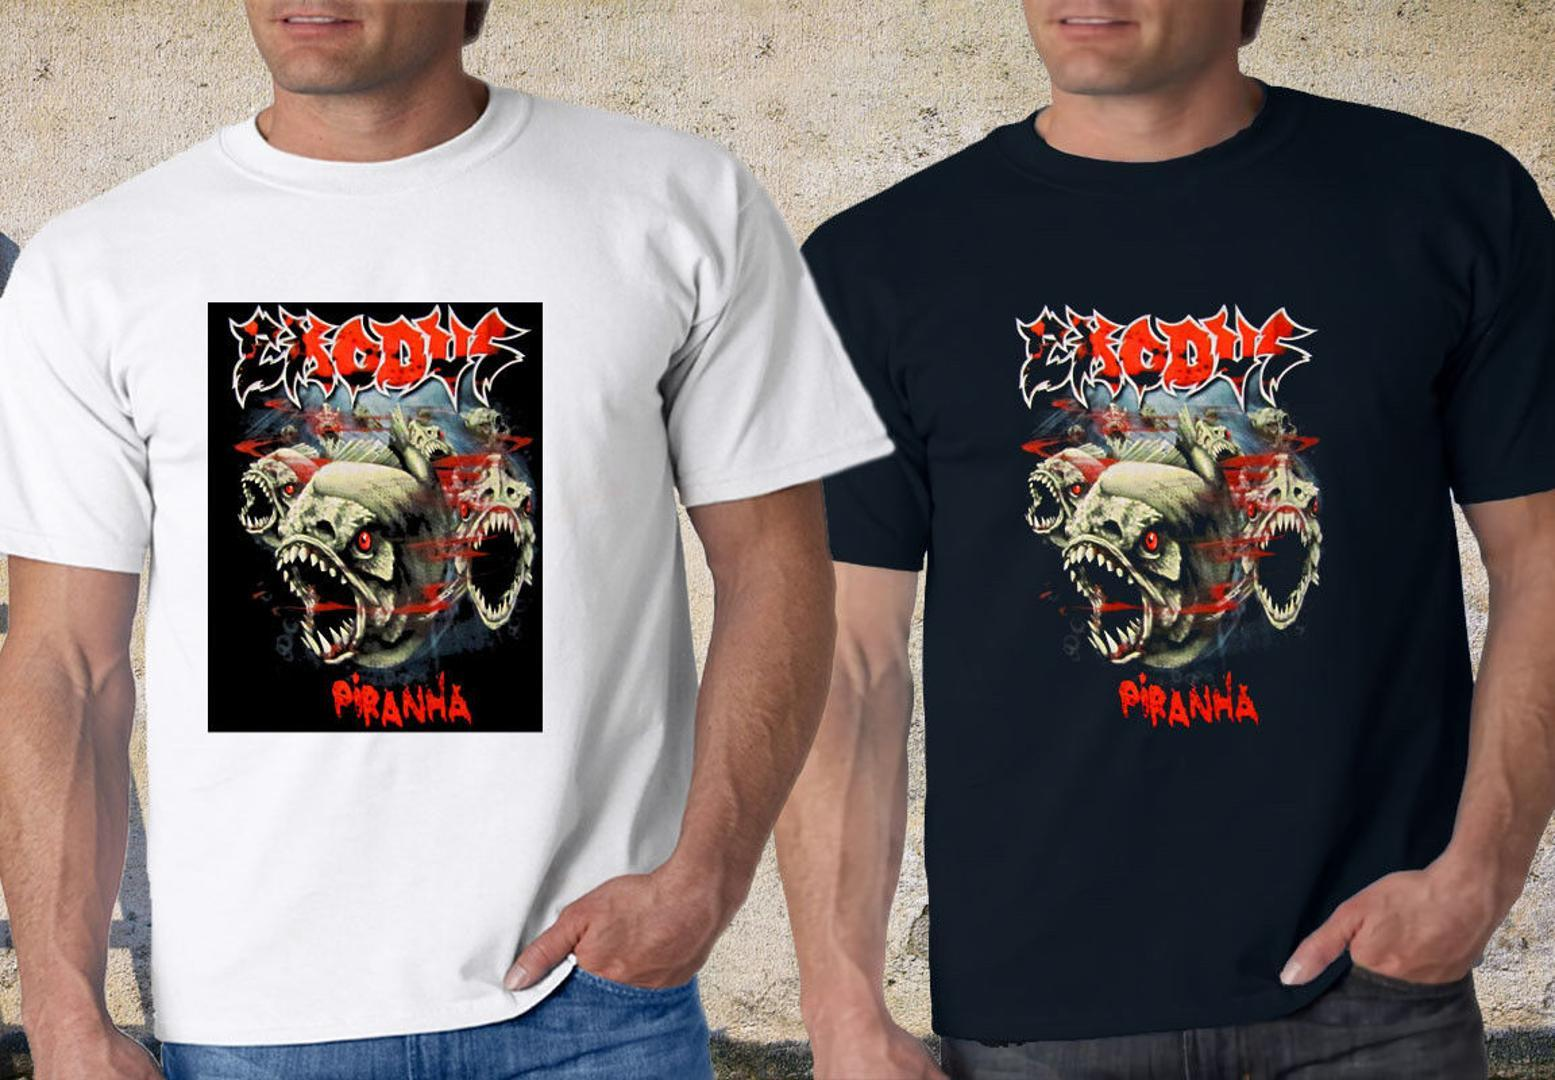 9dcc5cd632 EXODUS Bloody PIRANHA Men's Black & White T Shirt S-3XL custom design Tshirt  O-Neck Summer Personality Fashion Men T-Shirts